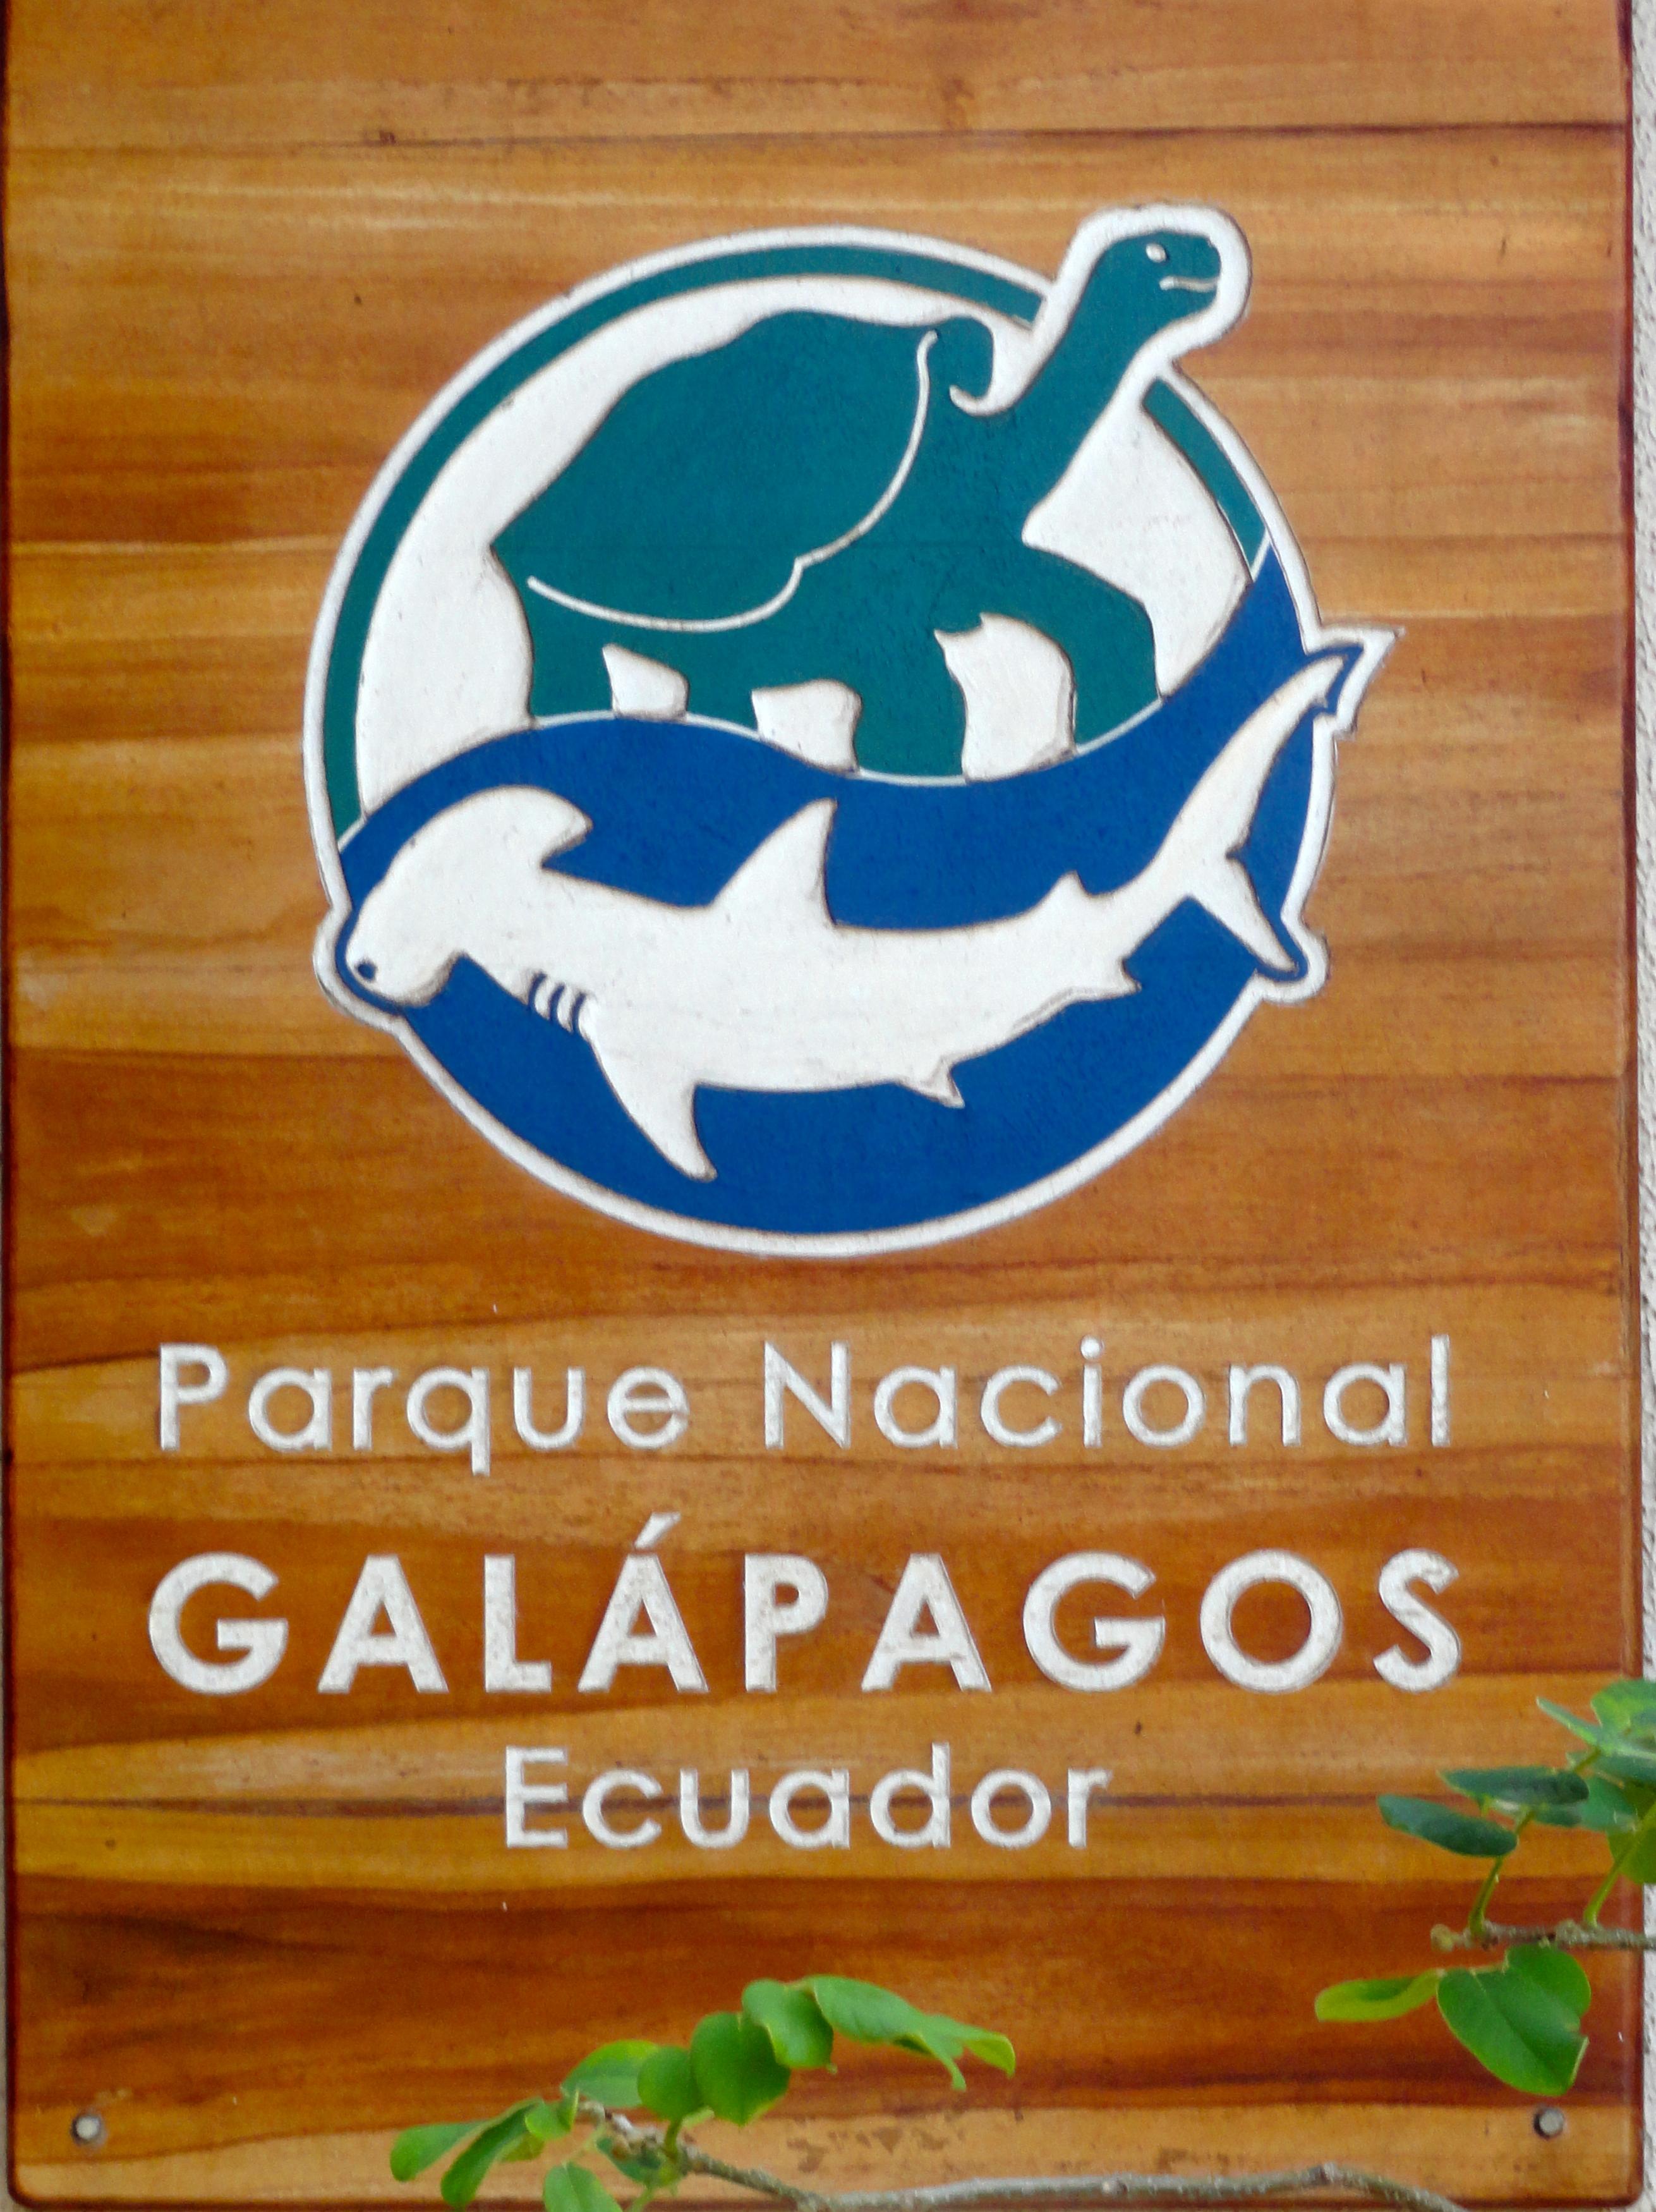 GALAPAGOS GIANT TORTOISES – Bring Sunscreen